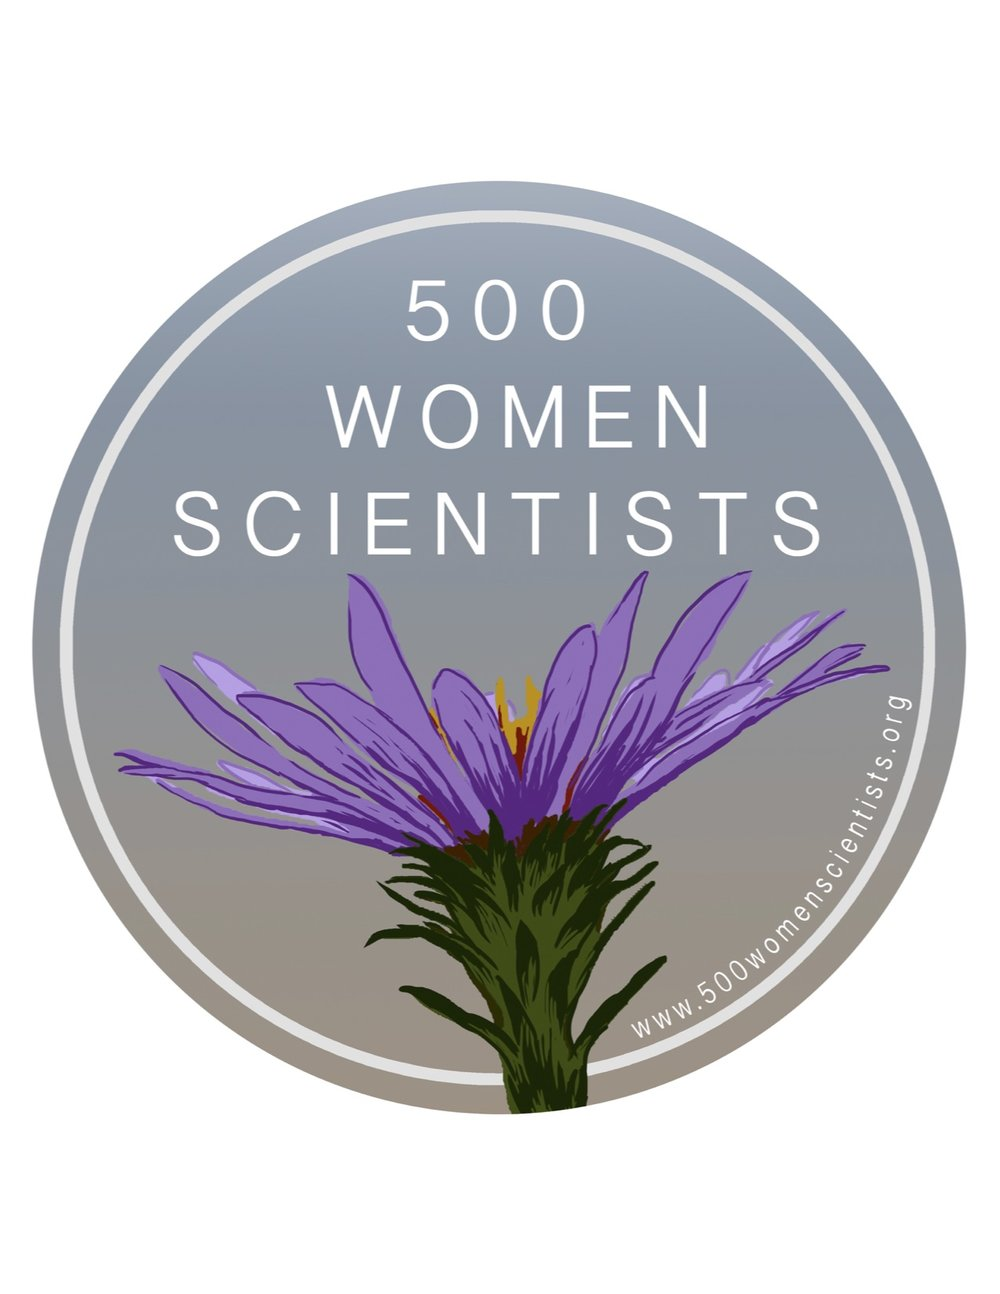 Signatories — 500 Women Scientists